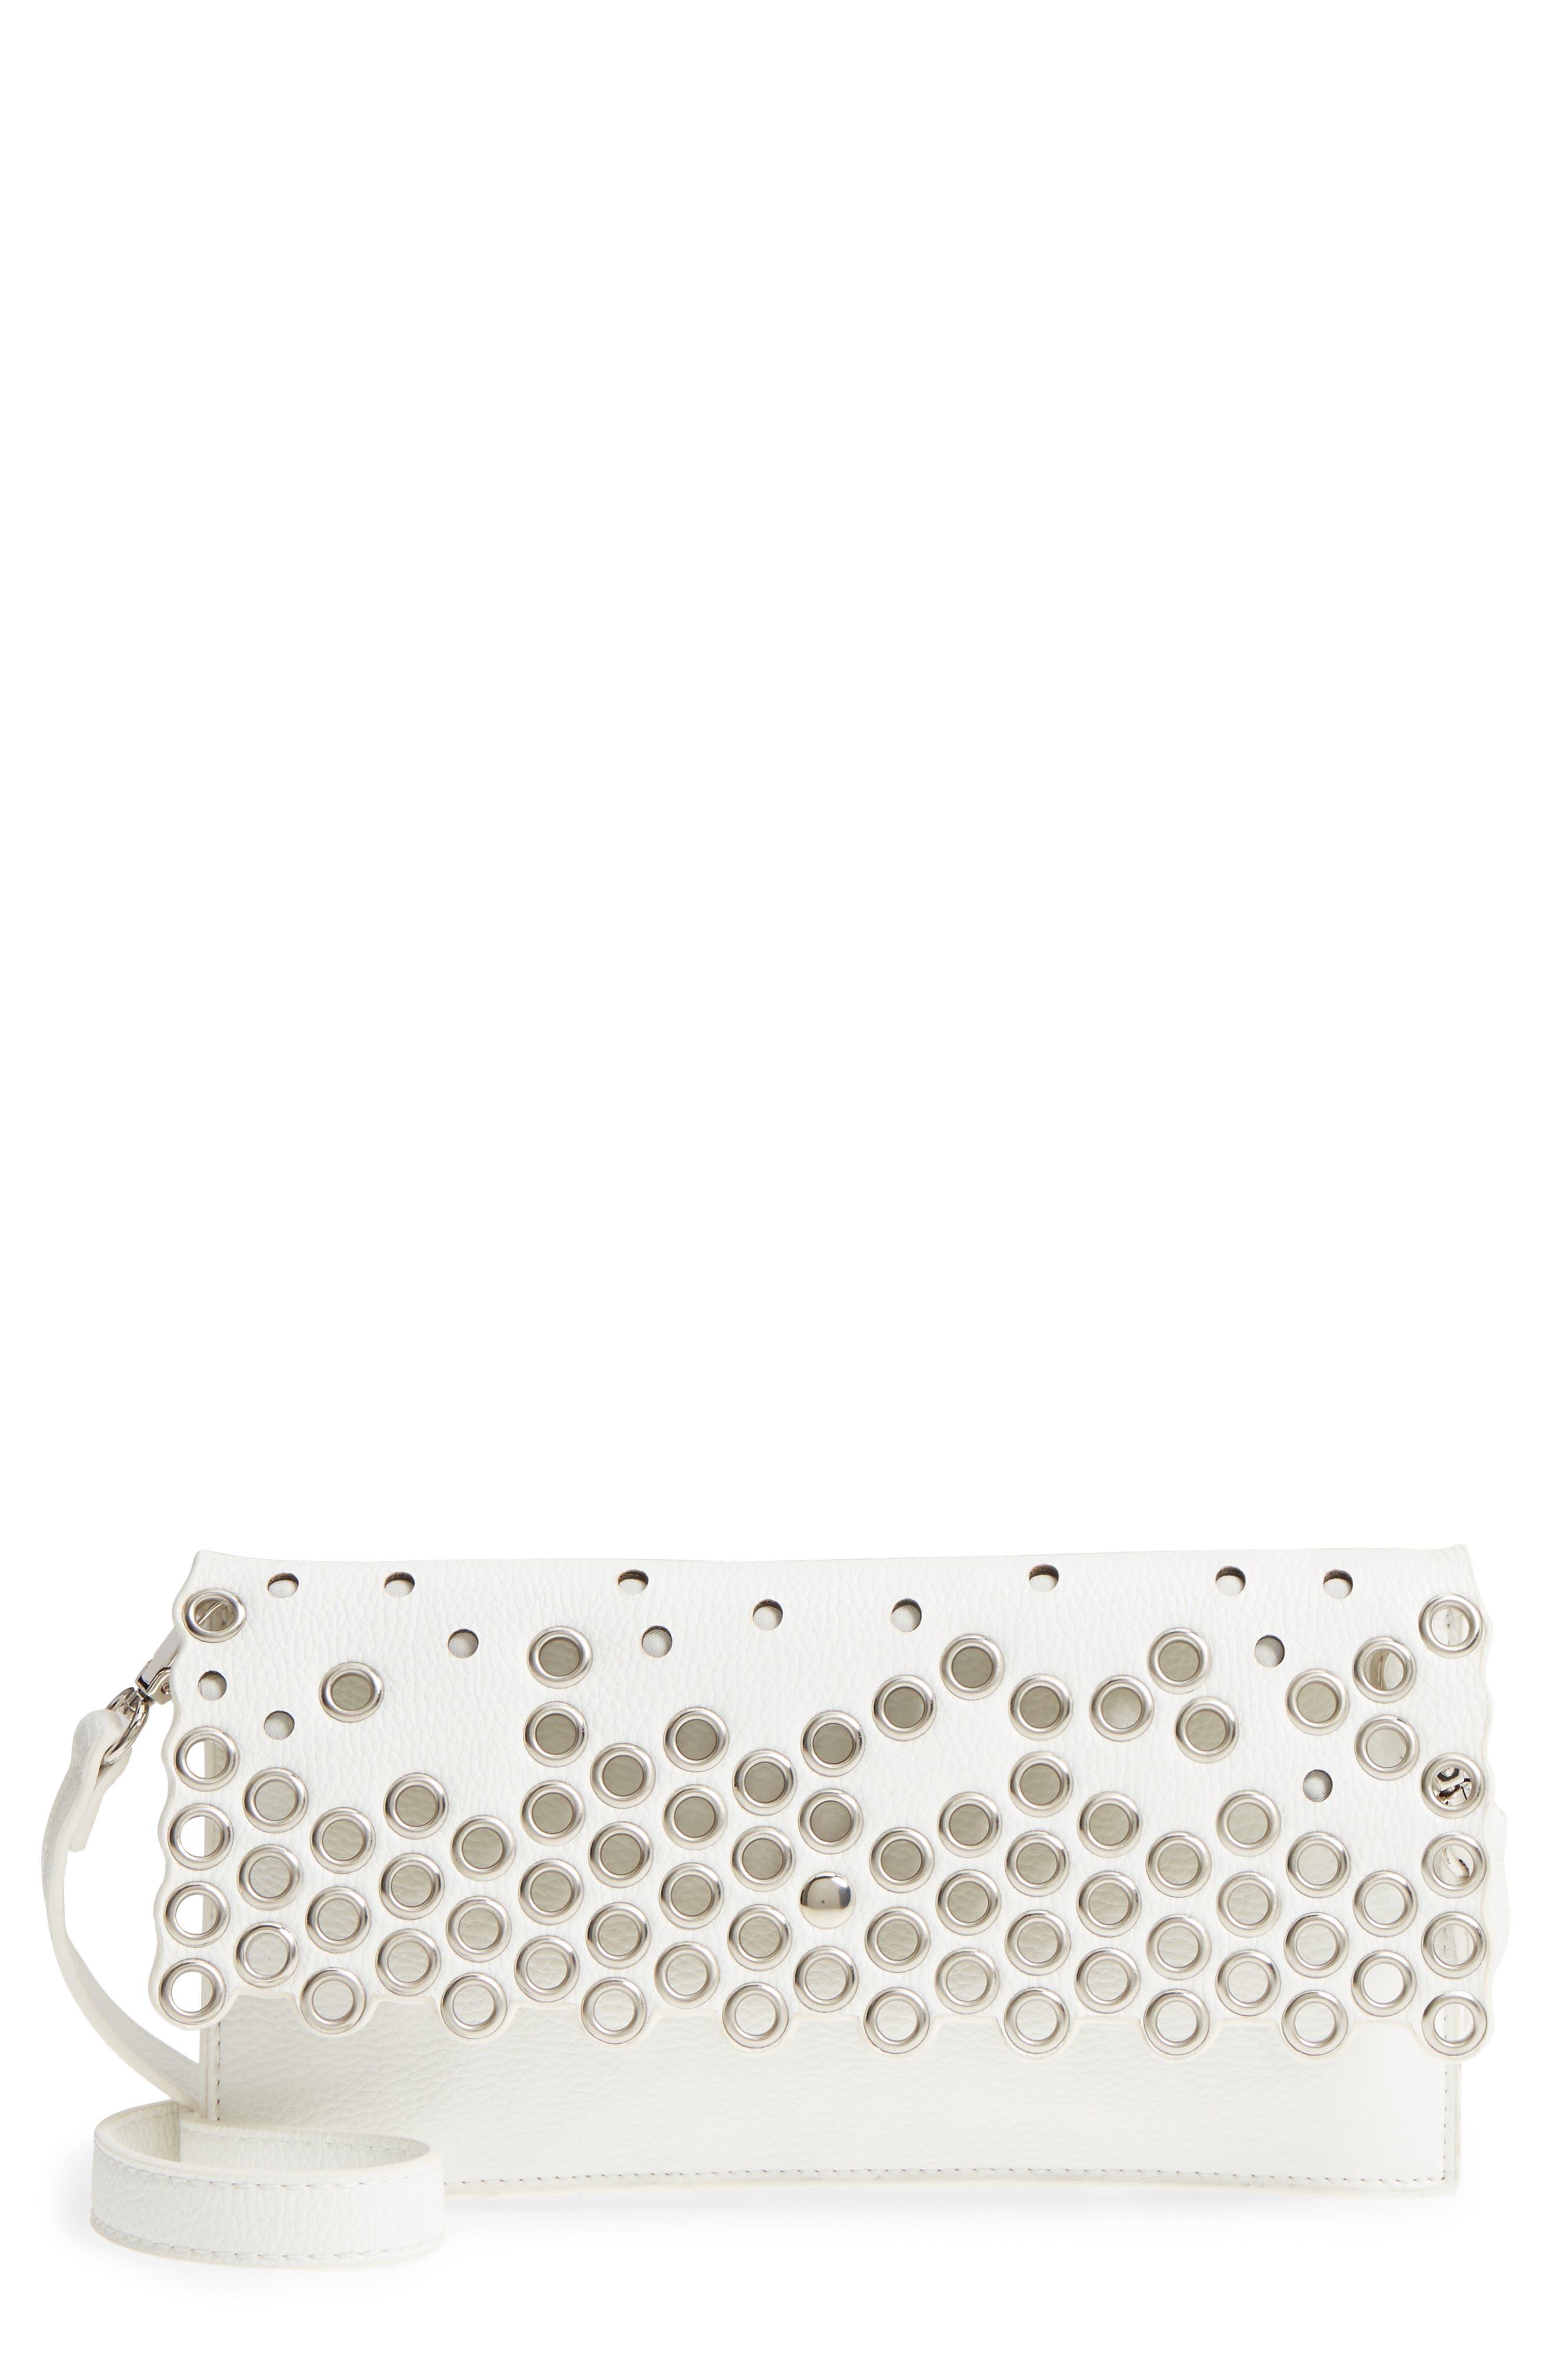 Grommet Convertible Crossbody Bag,                         Main,                         color, White